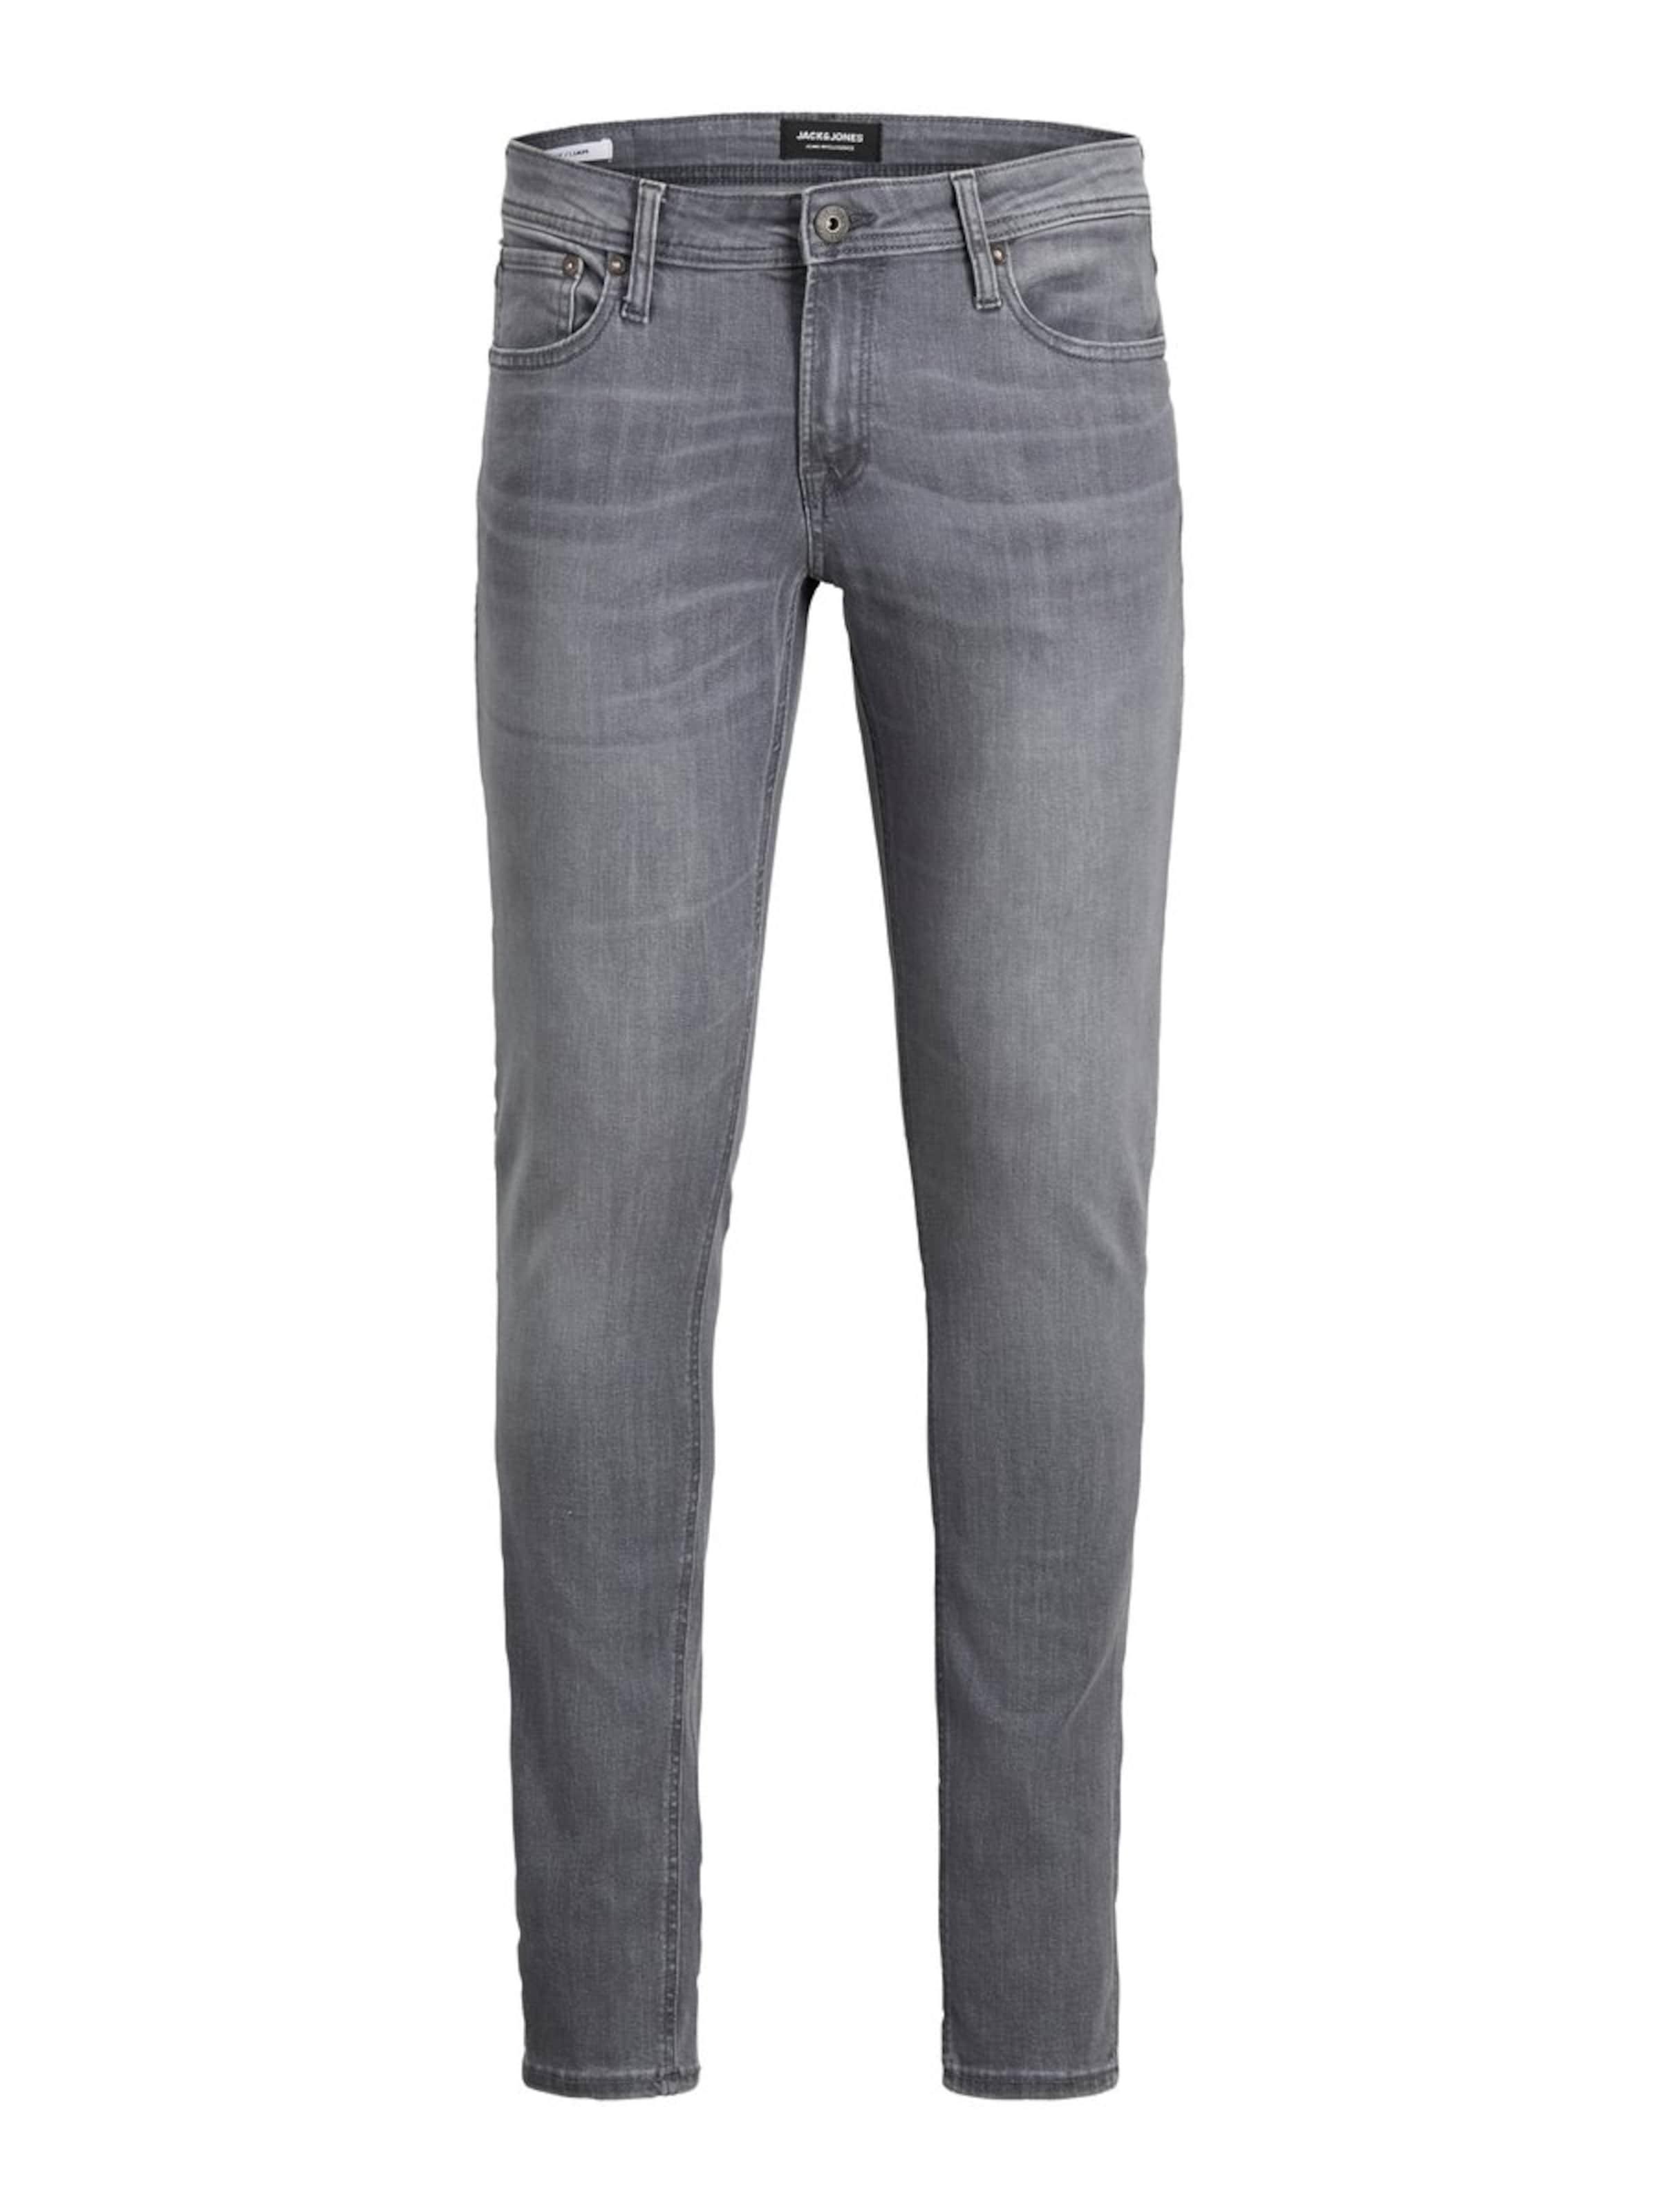 Jeans 838' Am Grau 'liam Jackamp; Original In Jones BeWxrodC